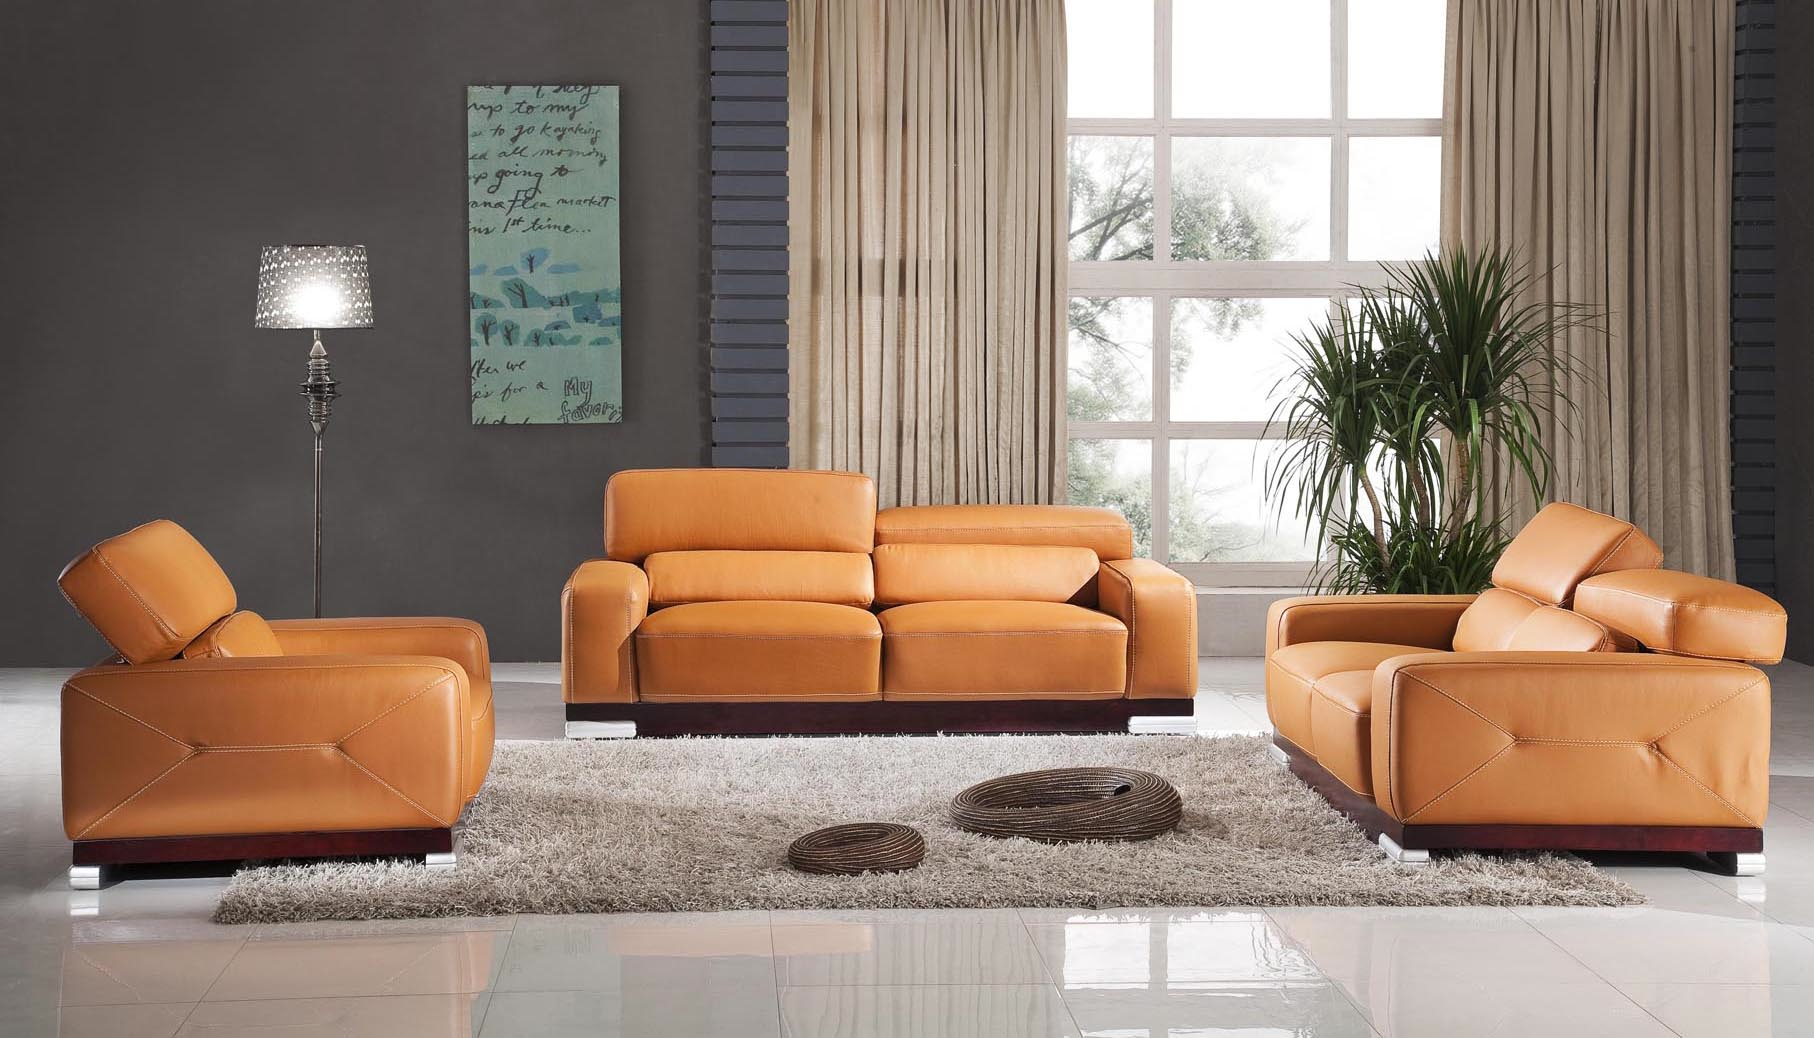 sitting sofa designs pottery barn basic slipcovered reviews modern living room sets